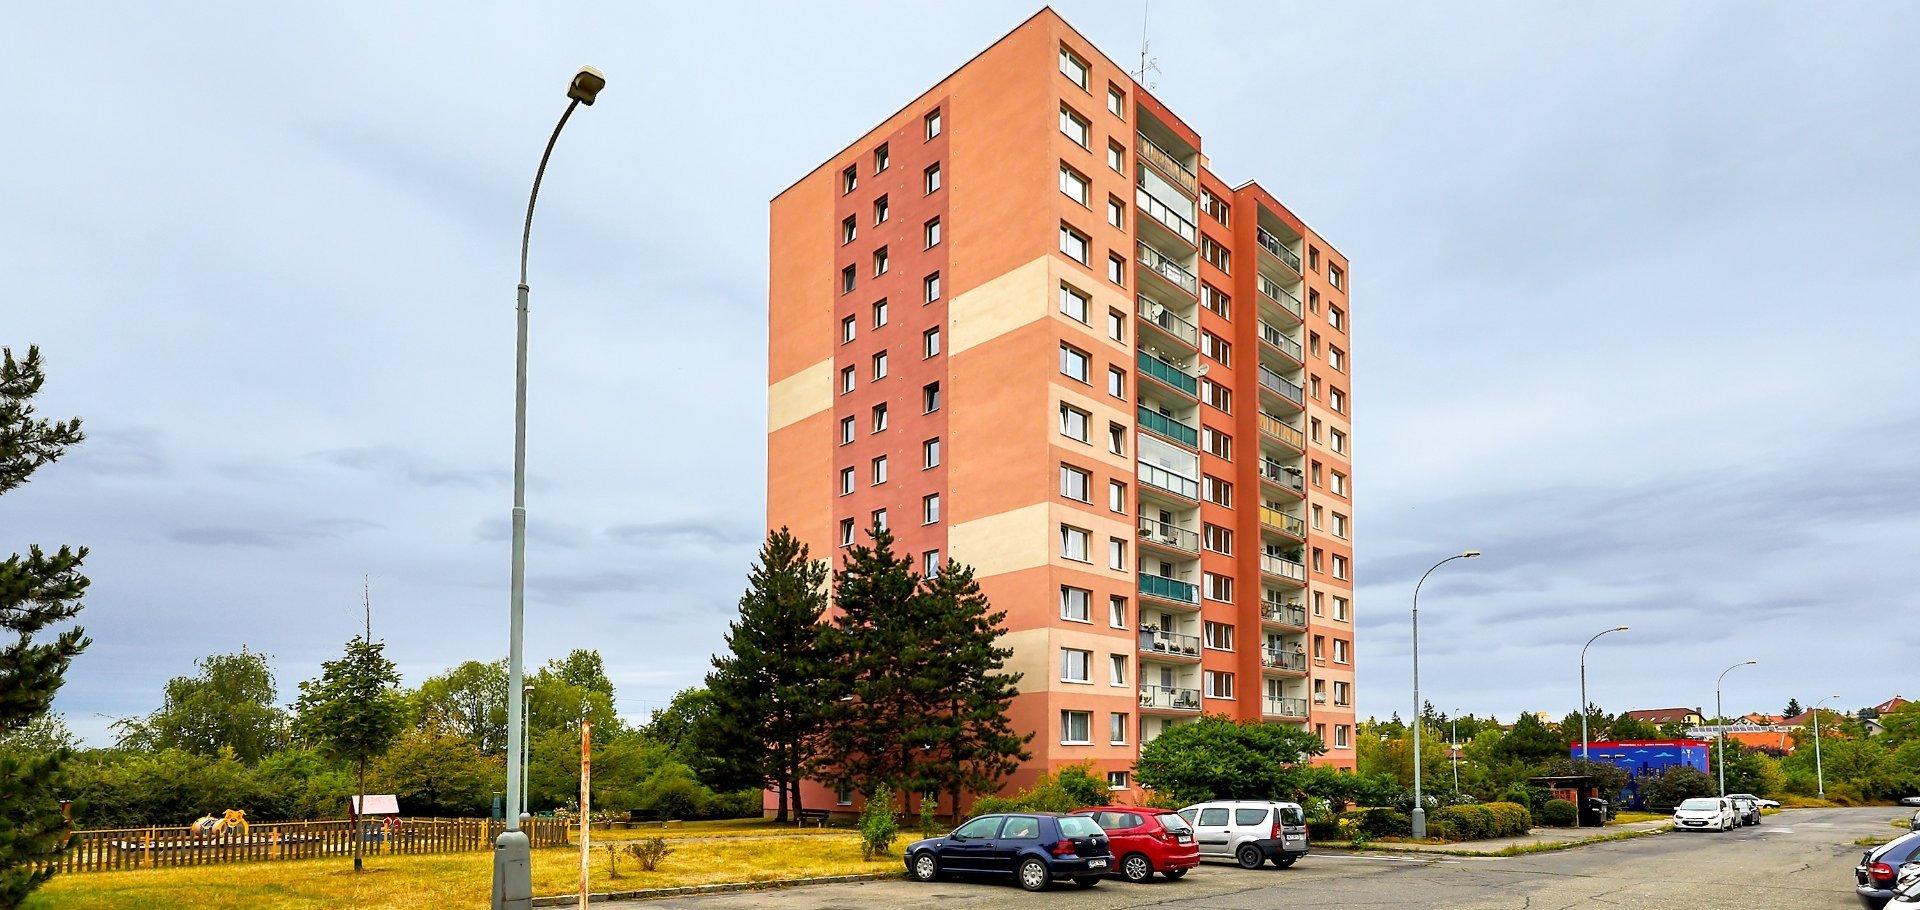 Prodej, Byty 2+1, 50m², ulice Smotlachova, Praha 4-Kamýk